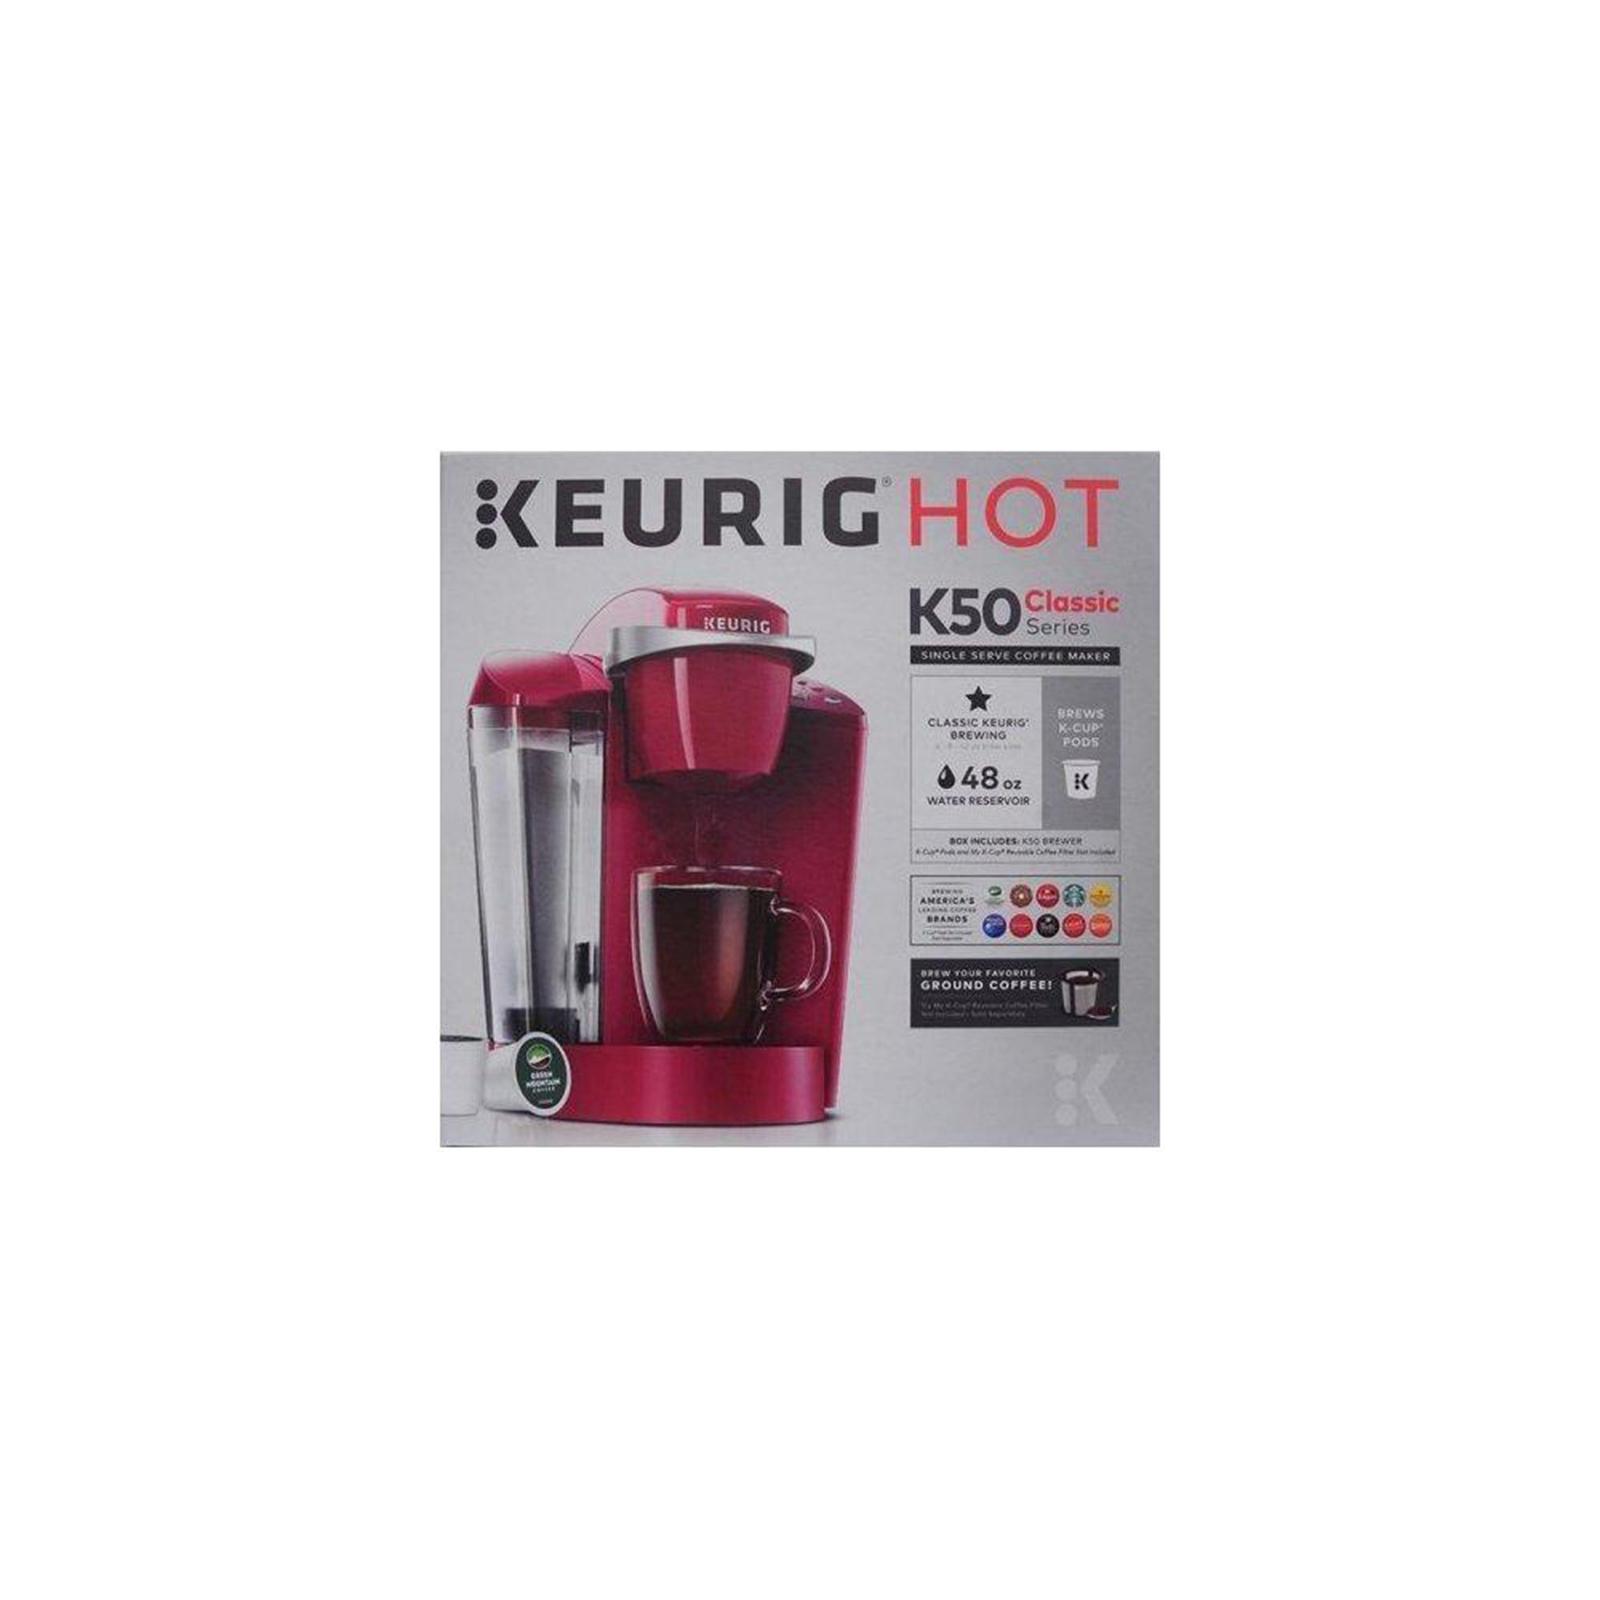 Keurig K50 K Classic Coffee Maker Sears Marketplace